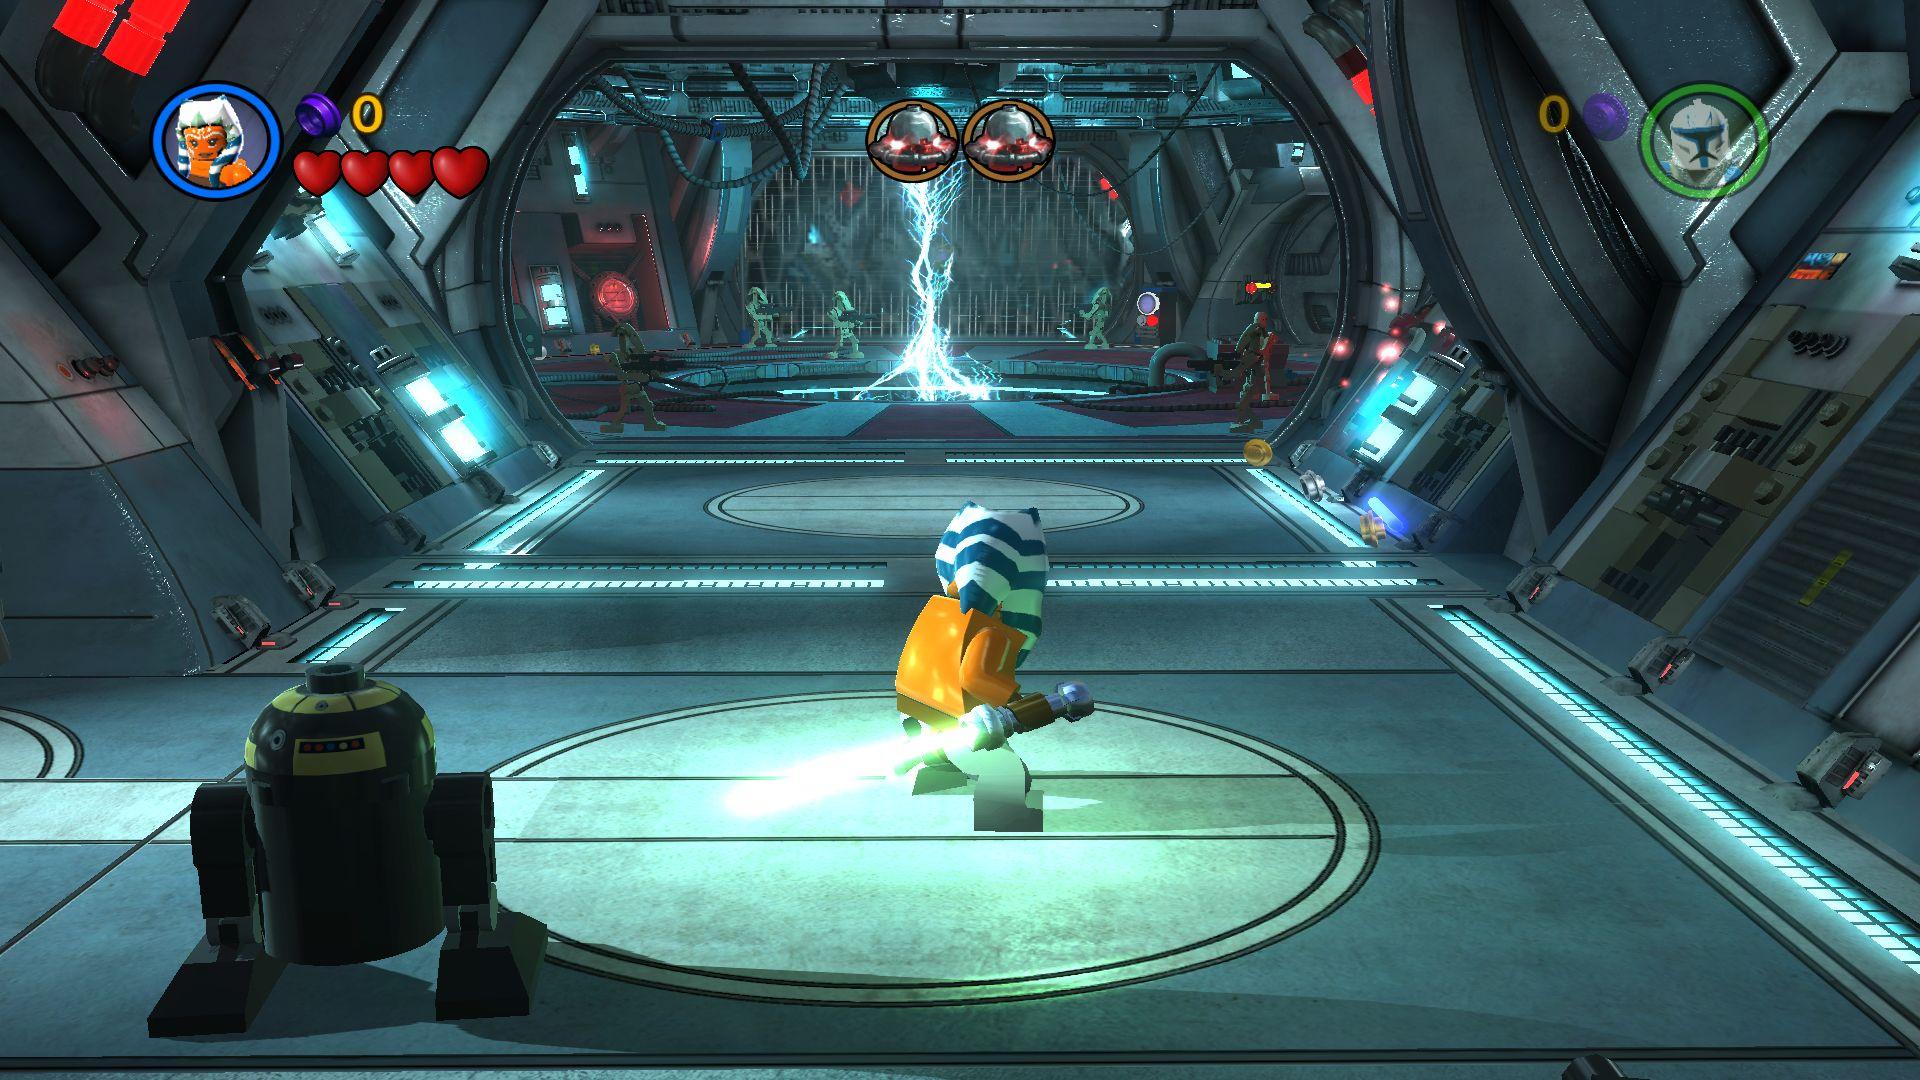 Lego Star Wars Iii The Clone Wars On Steam